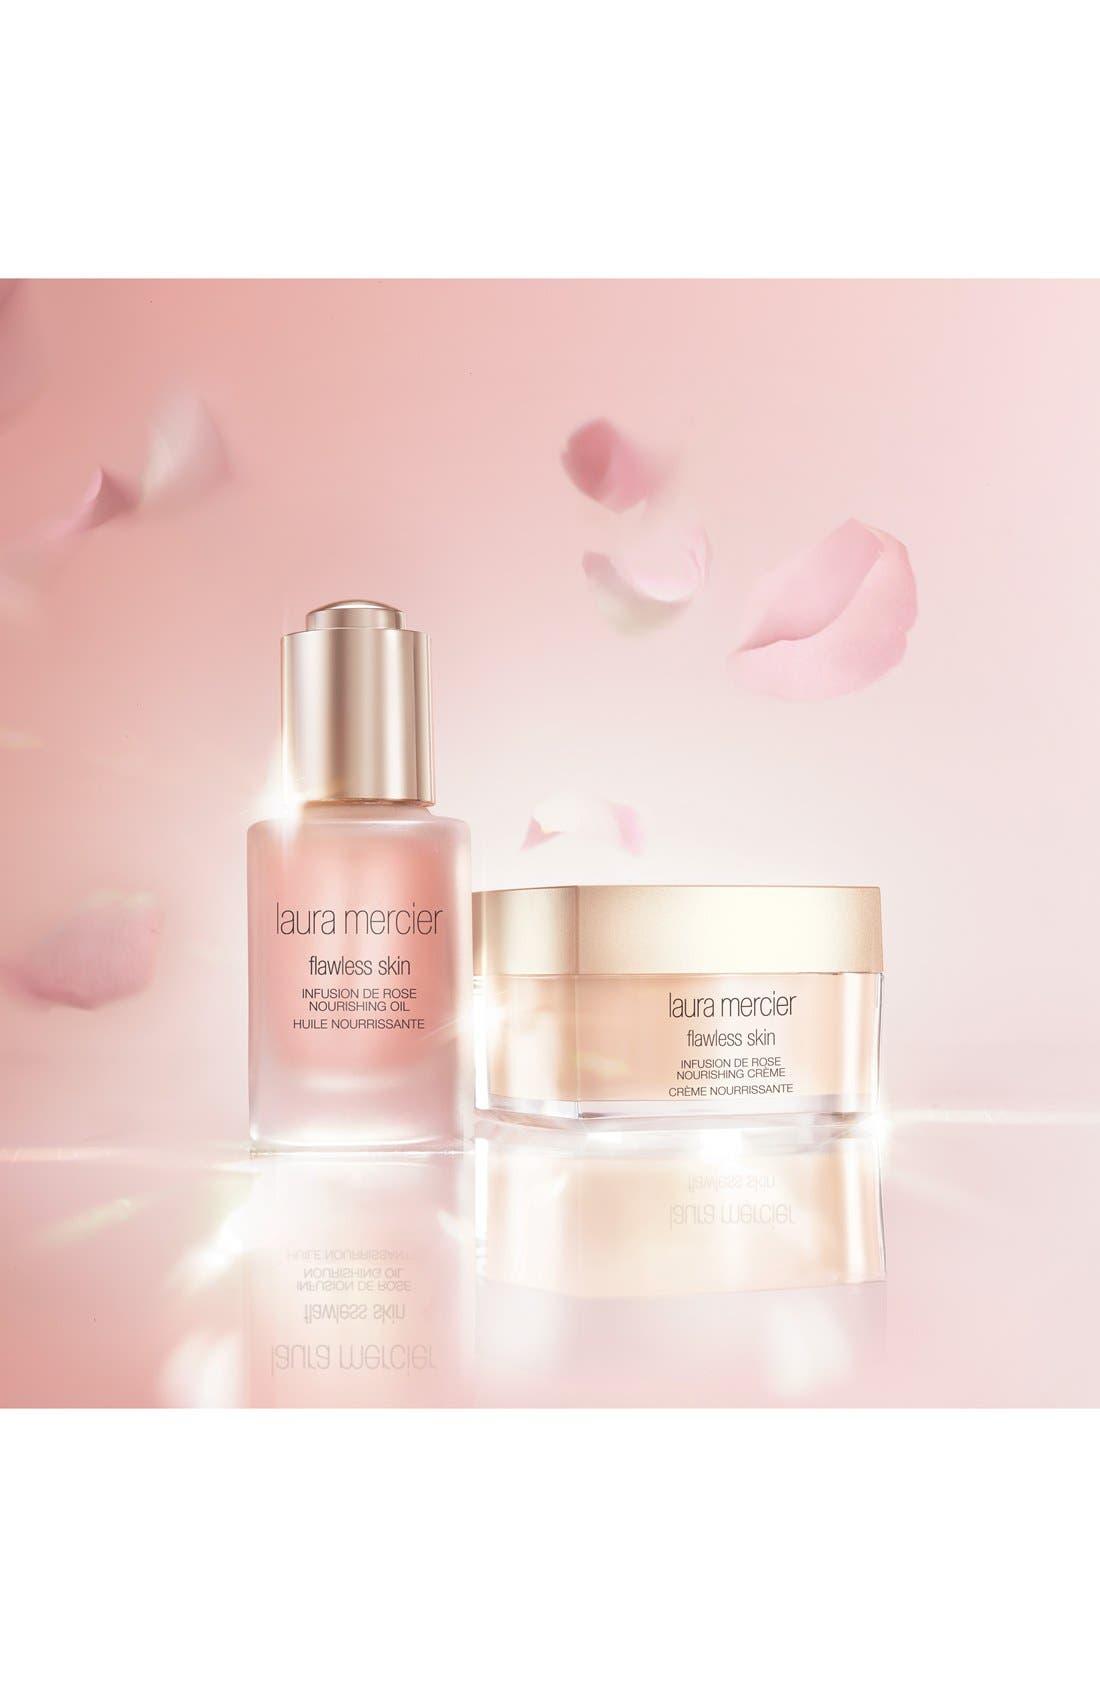 LAURA MERCIER, 'Flawless Skin' Infusion de Rose Nourishing Crème, Alternate thumbnail 2, color, NO COLOR